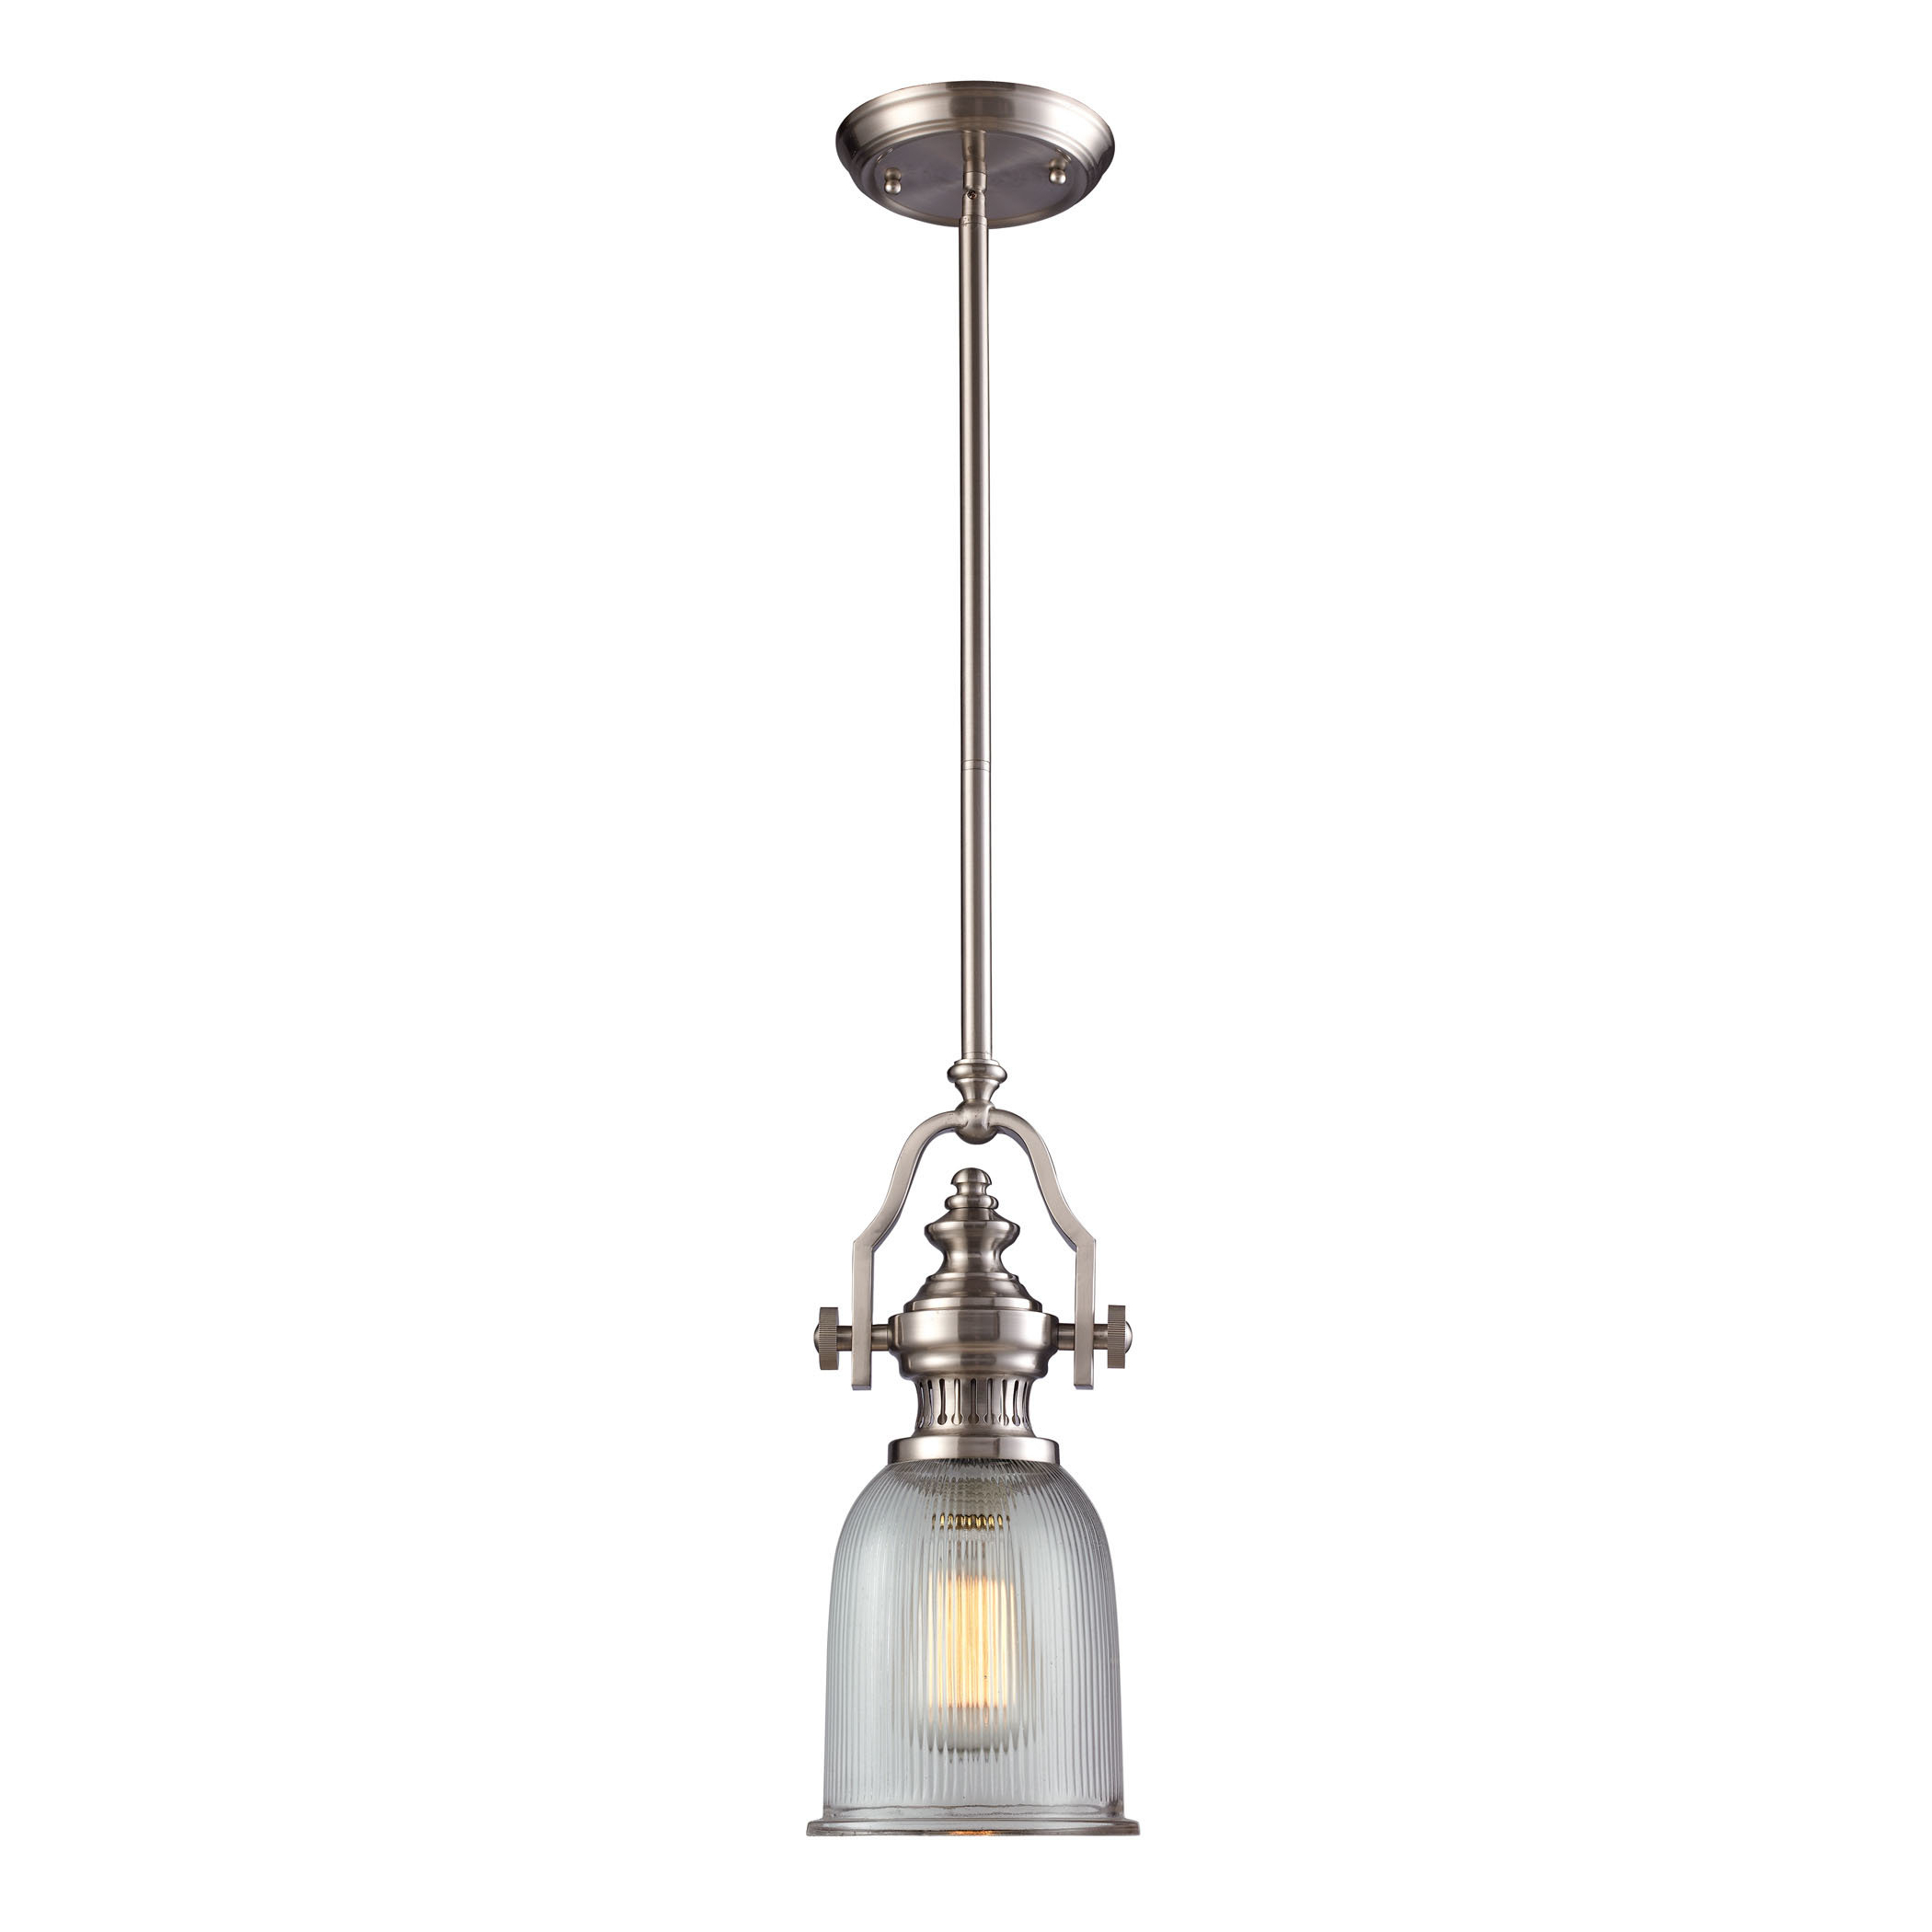 Birch Lane™ Heritage Erico 1 Light Single Bell Pendant In Newest Spokane 1 Light Single Urn Pendants (View 11 of 20)